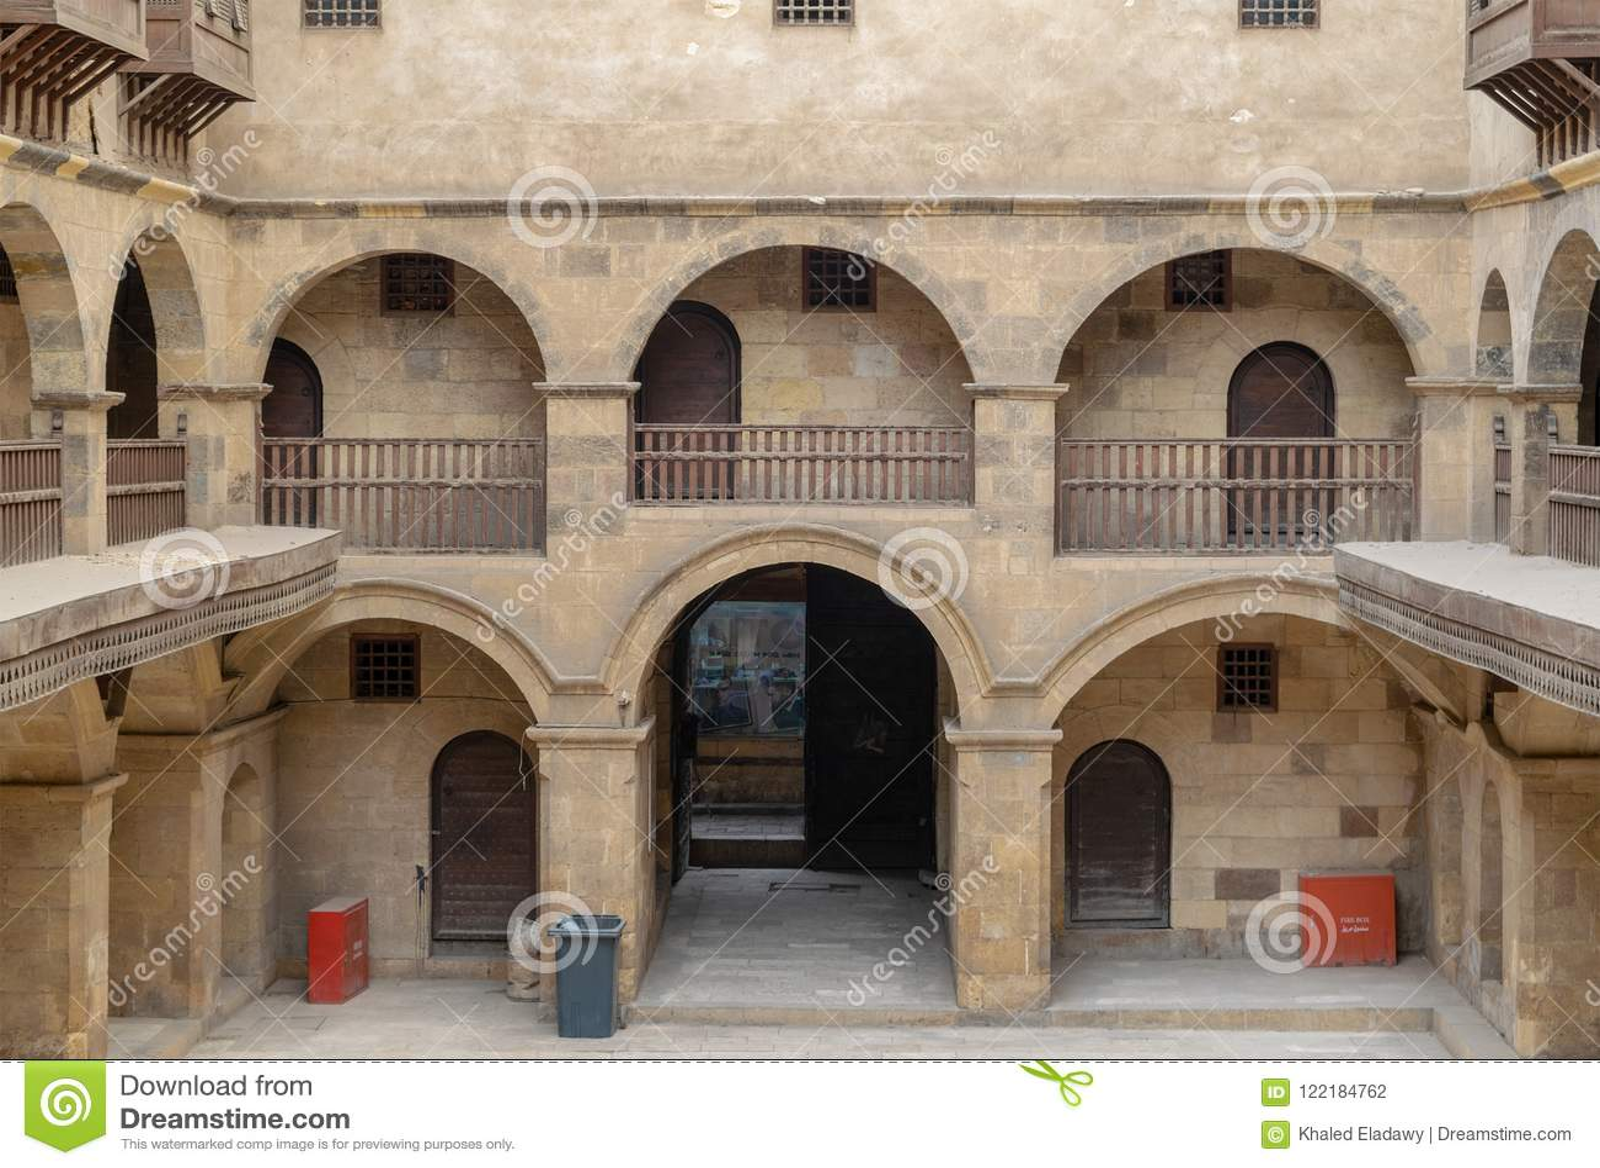 Bazaraa商队投宿的旅舍门面,当有圆顶拱廊和窗口盖由被插入的木栅格mashrabiyya,开罗,埃及